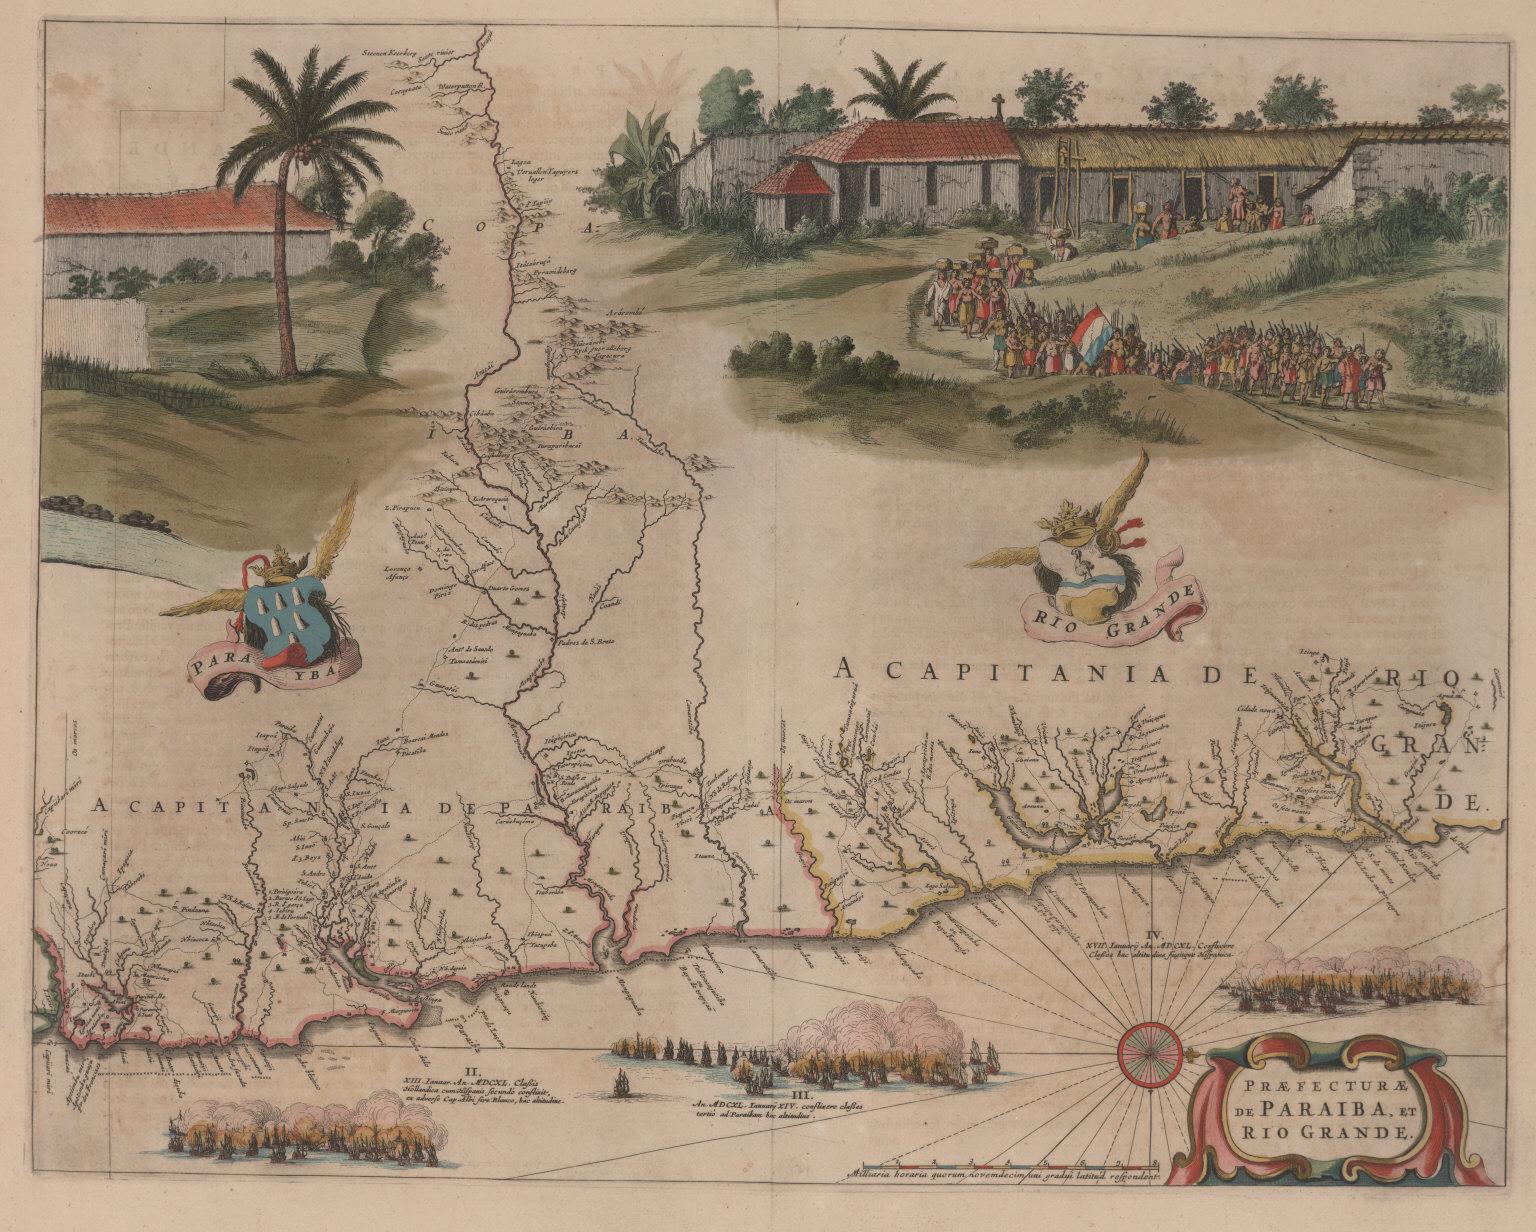 Praefecturae de Paraiba, et Rio Grande.